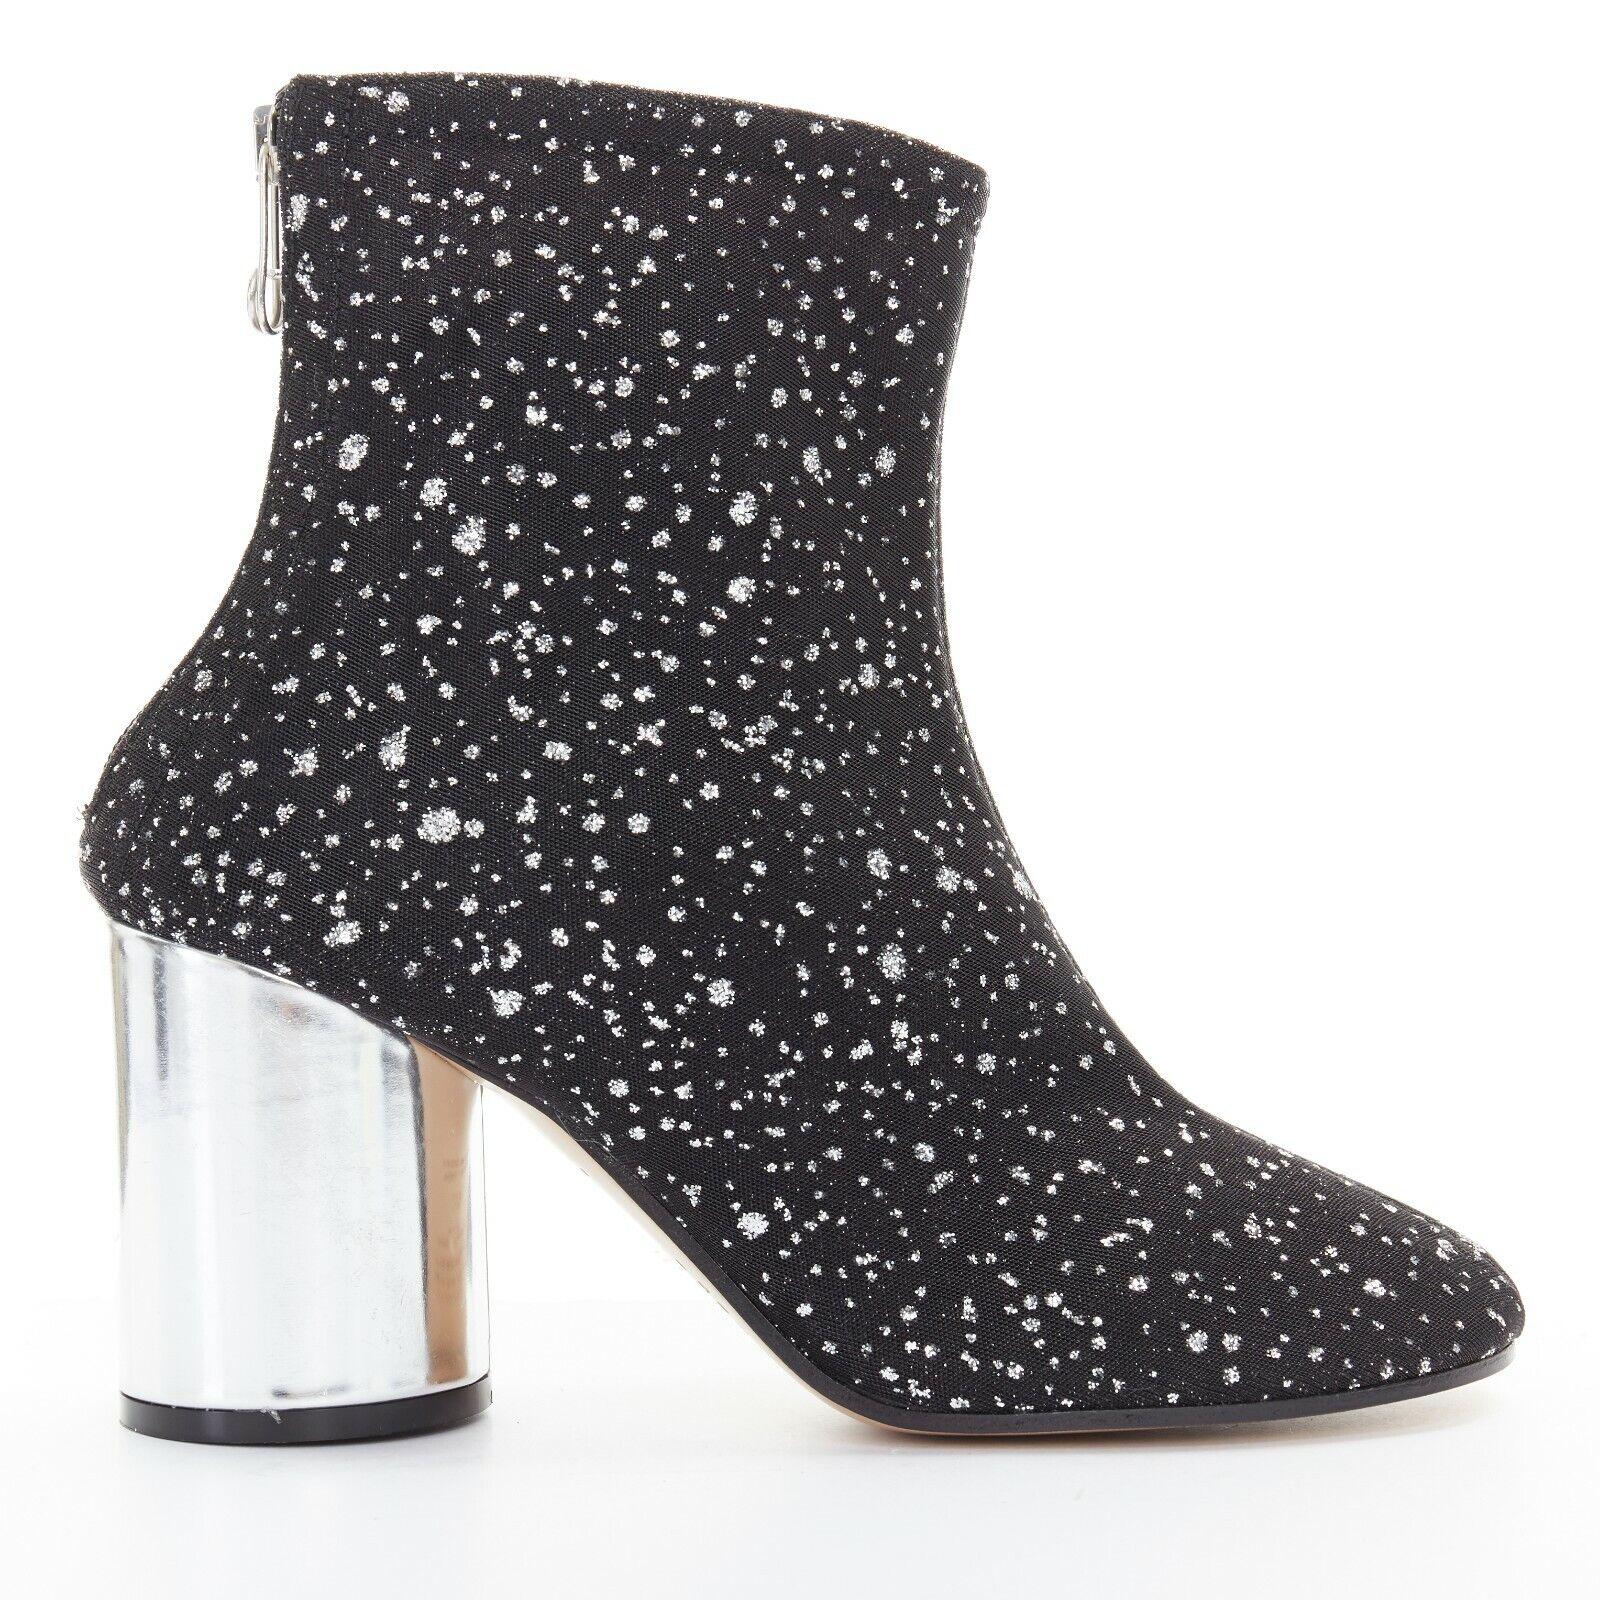 Nuevo Maison Margiela Malla Negra moteado Glitter plata grueso talón botín EU39